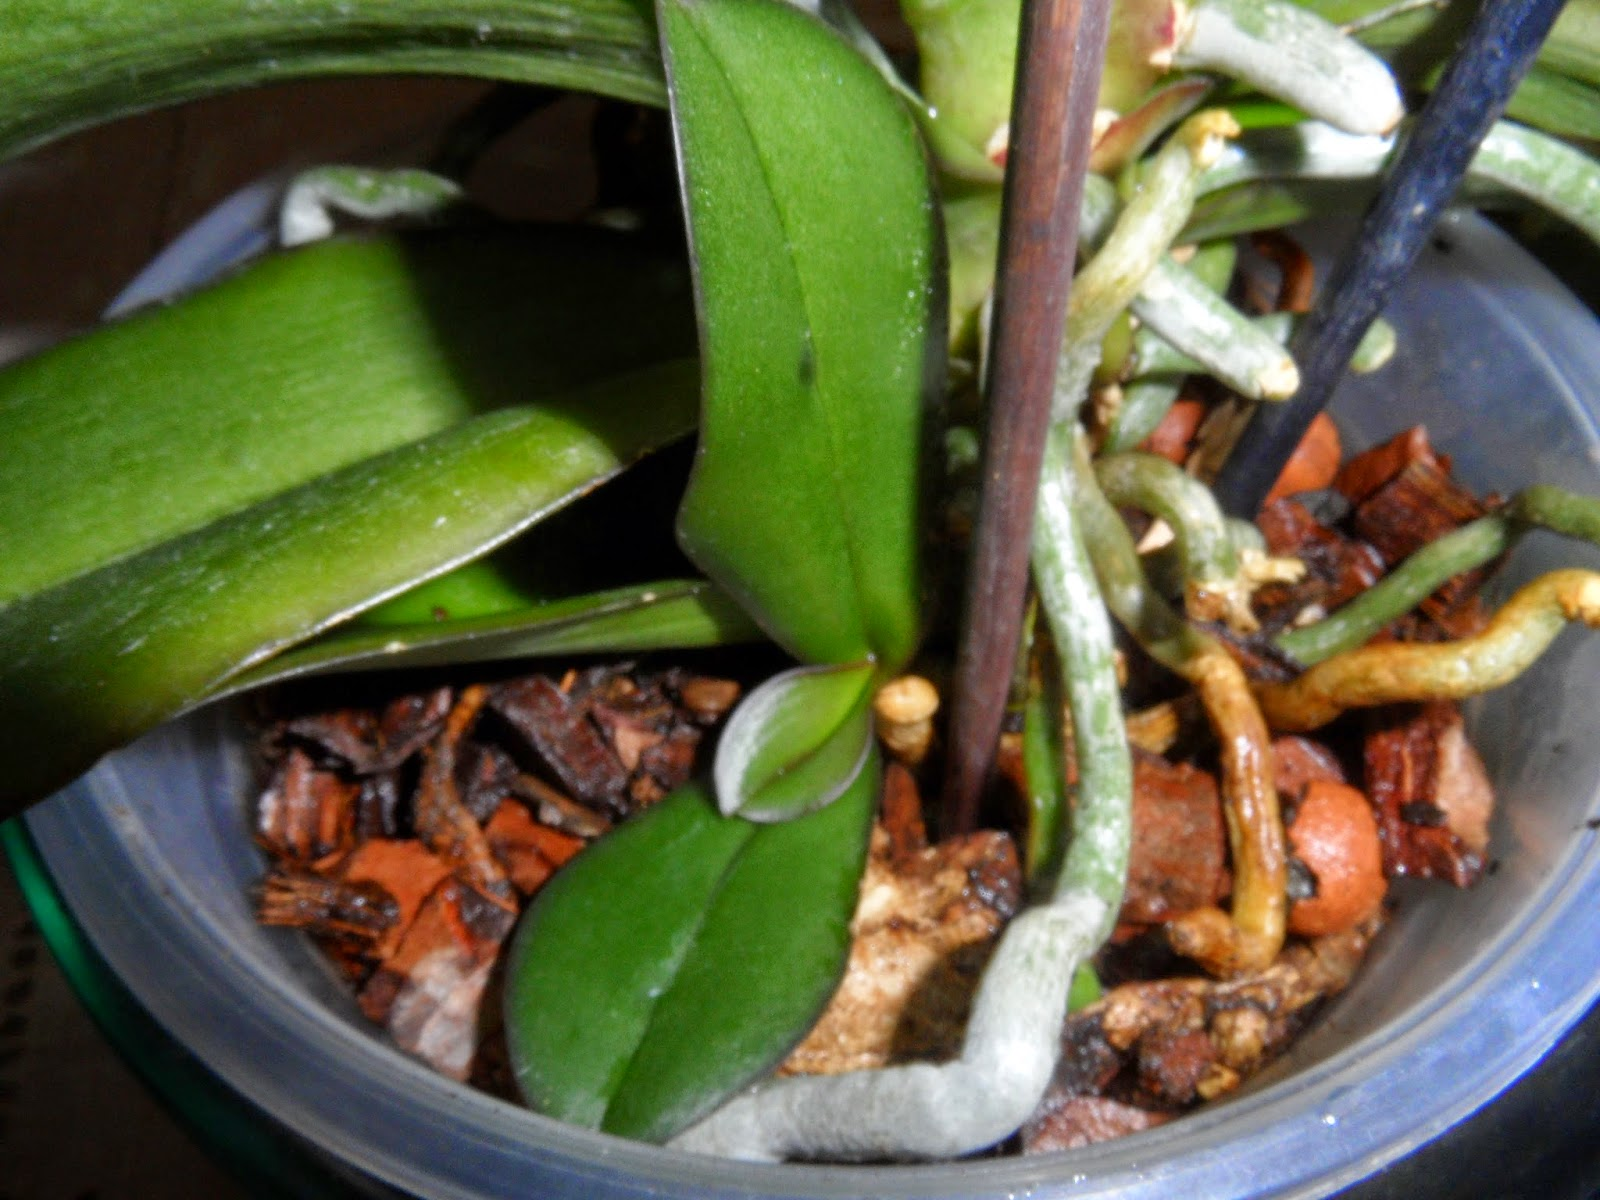 Las orquídeas de Berni